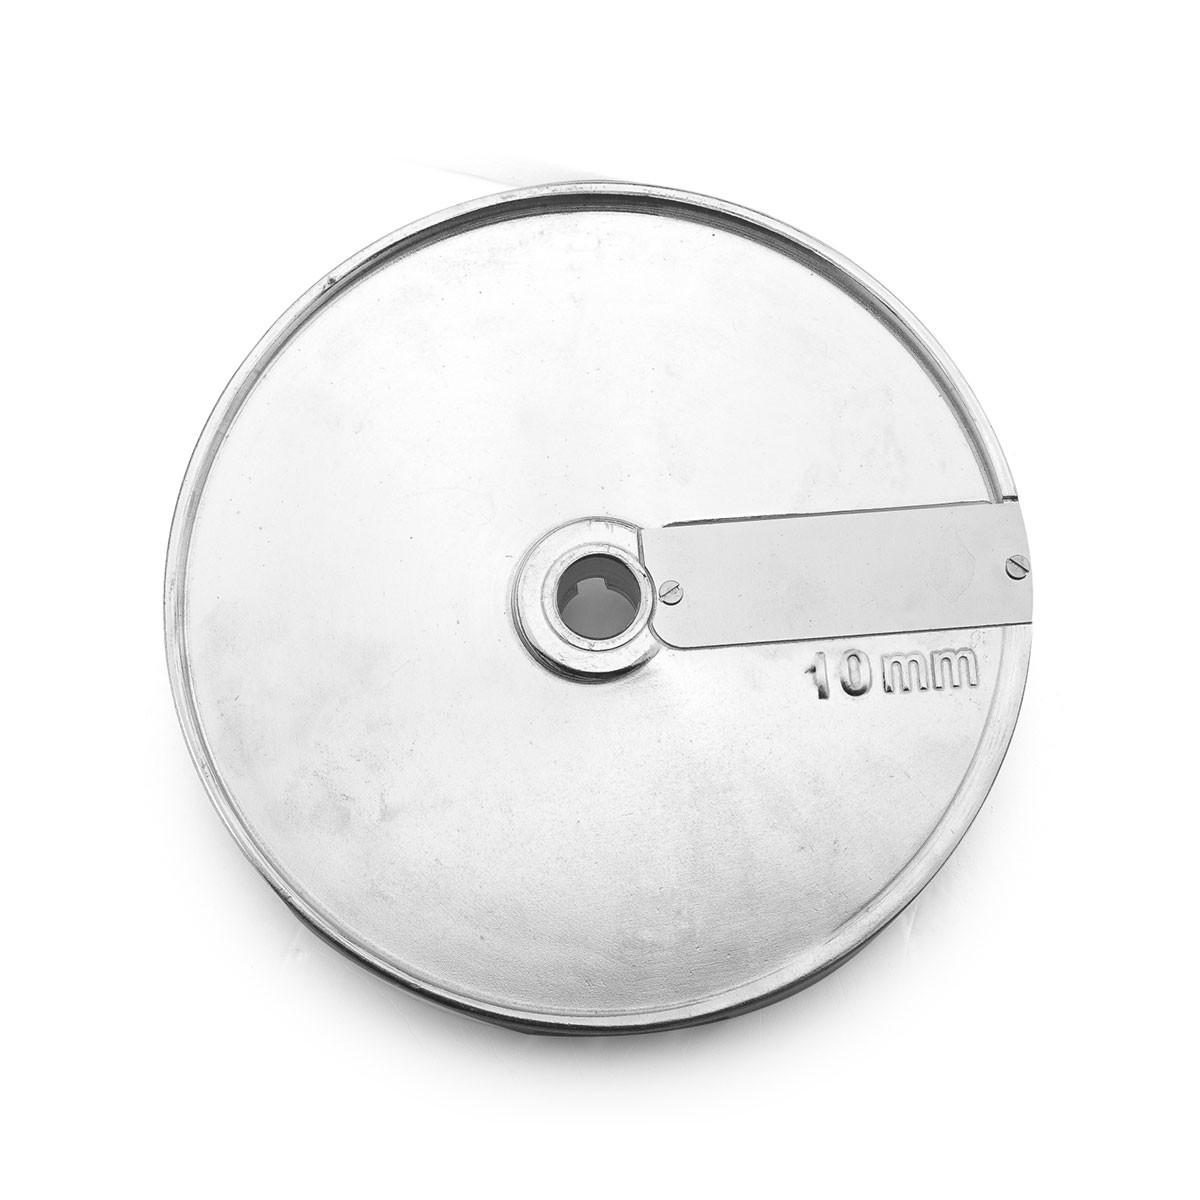 Schneidescheibe AS0010 aus Aluminium - 10 mm Saro